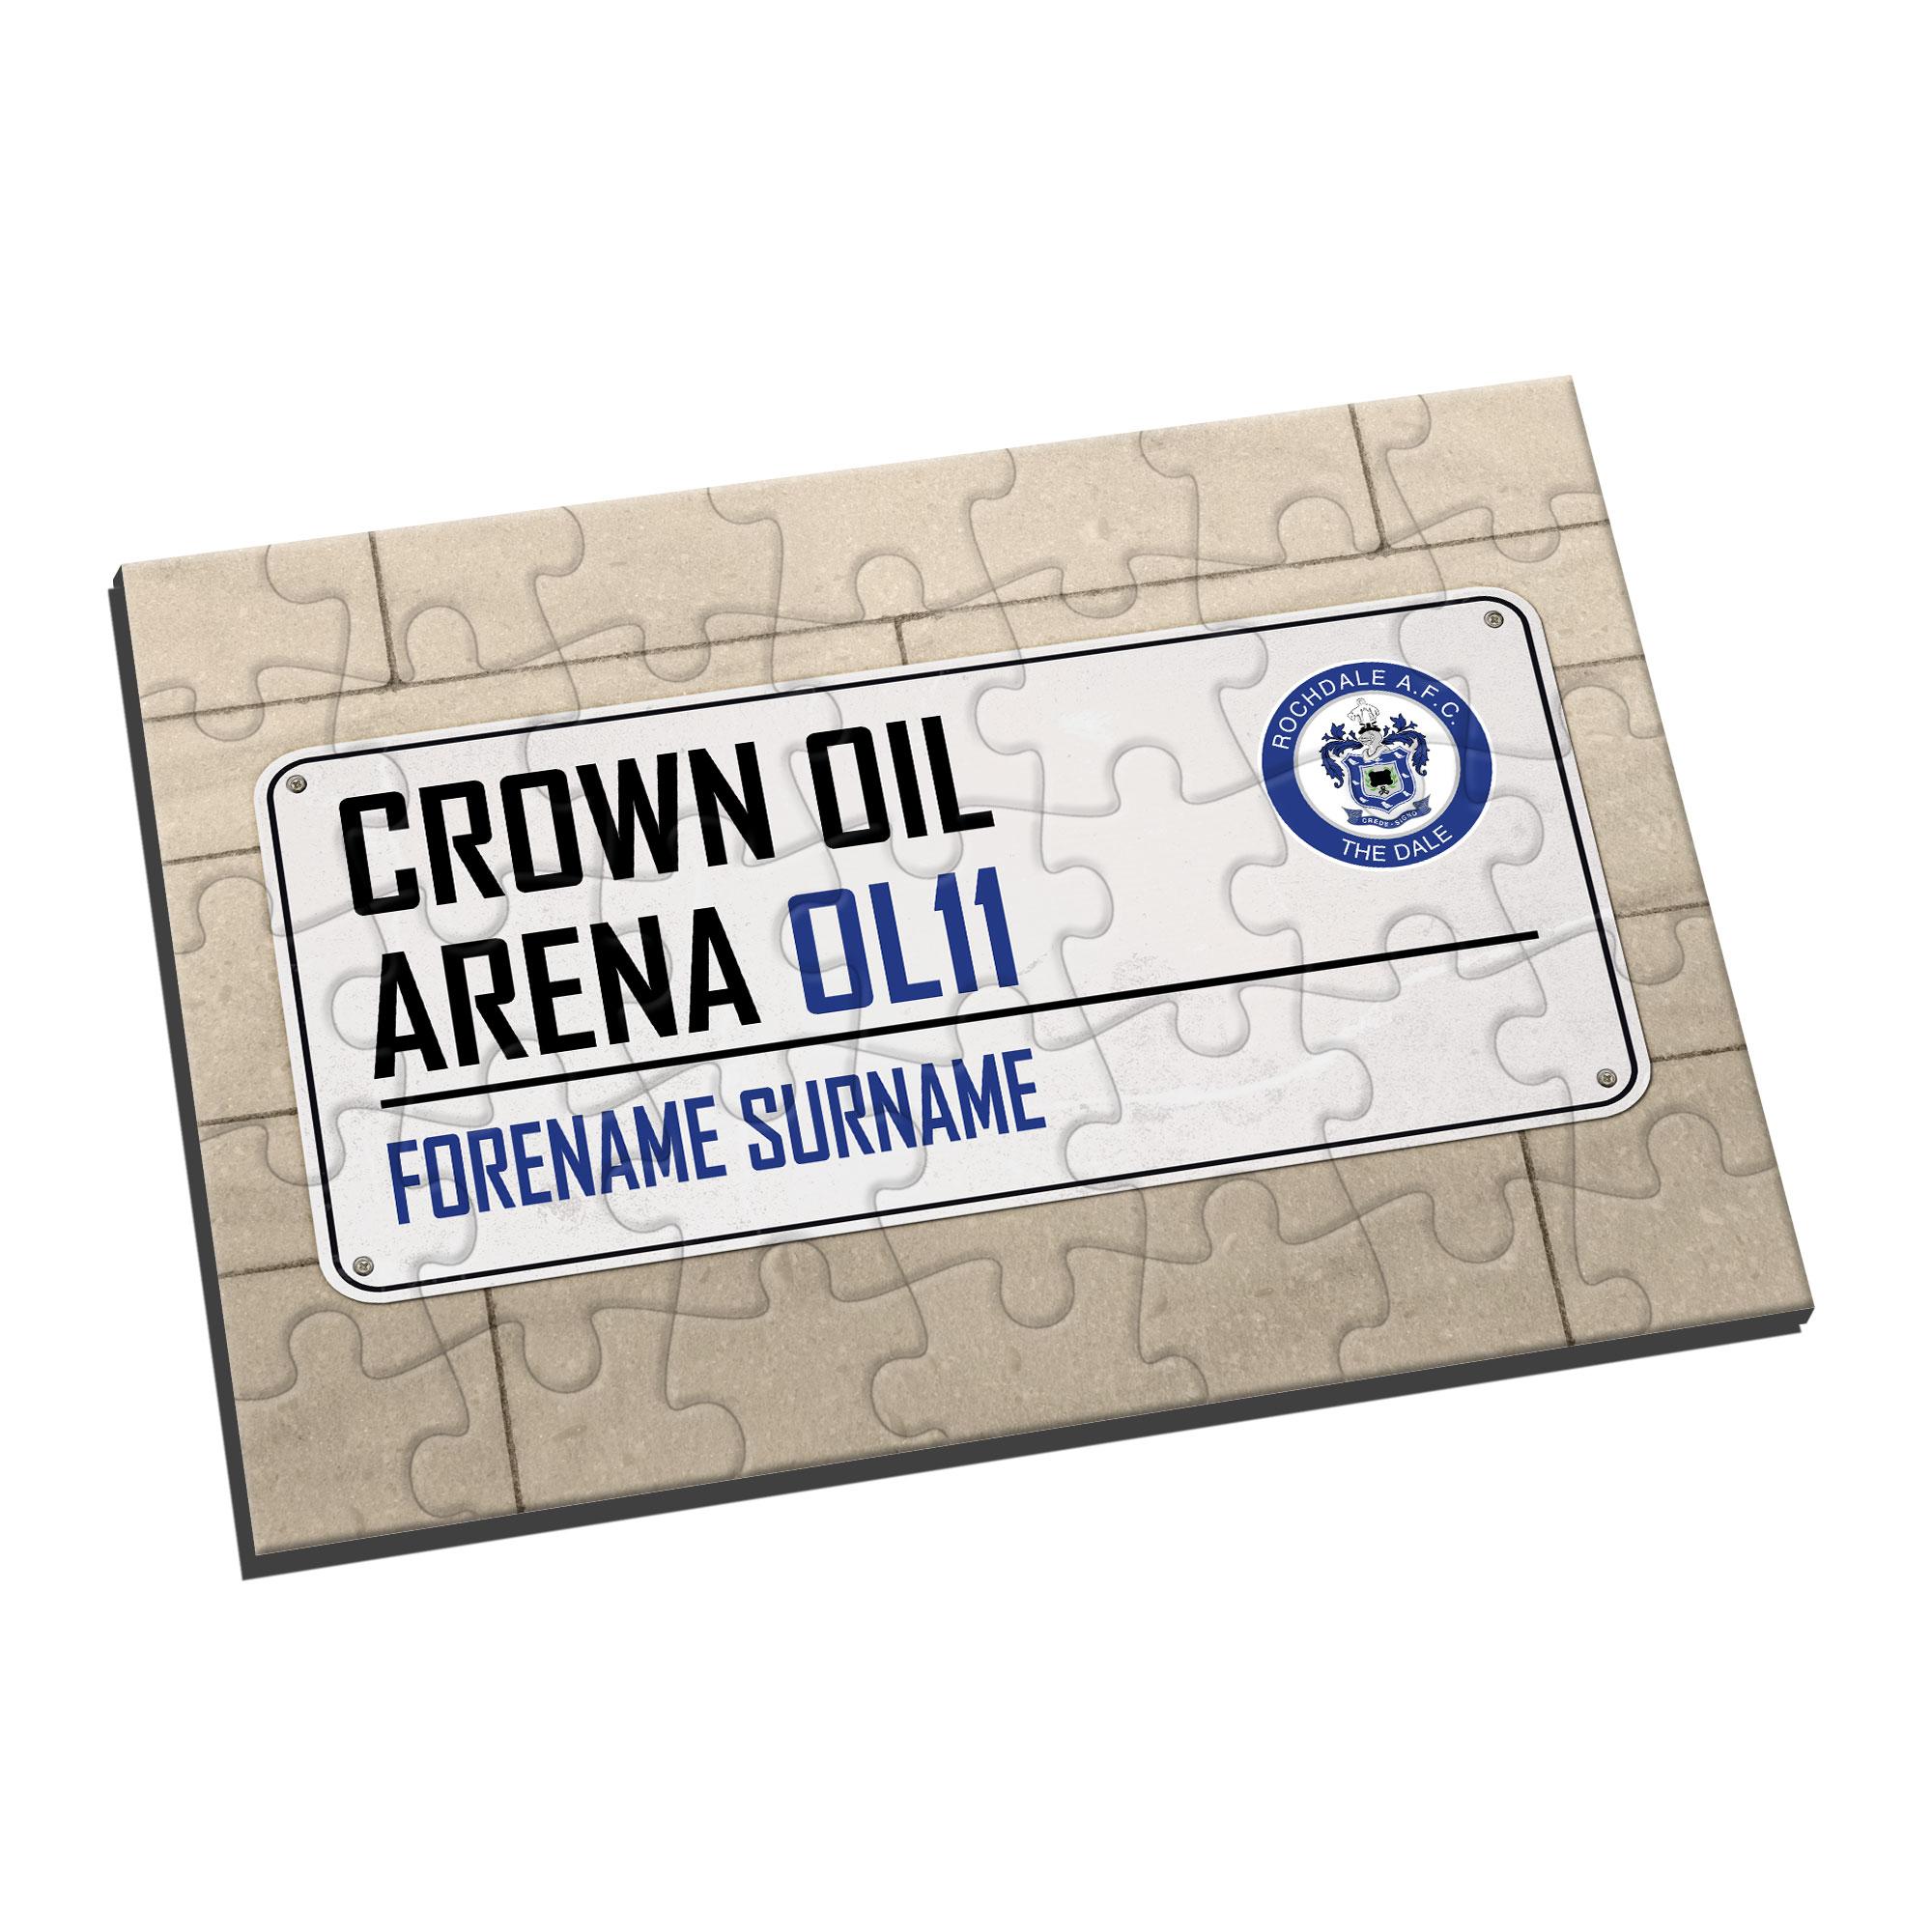 Rochdale AFC Street Sign Jigsaw